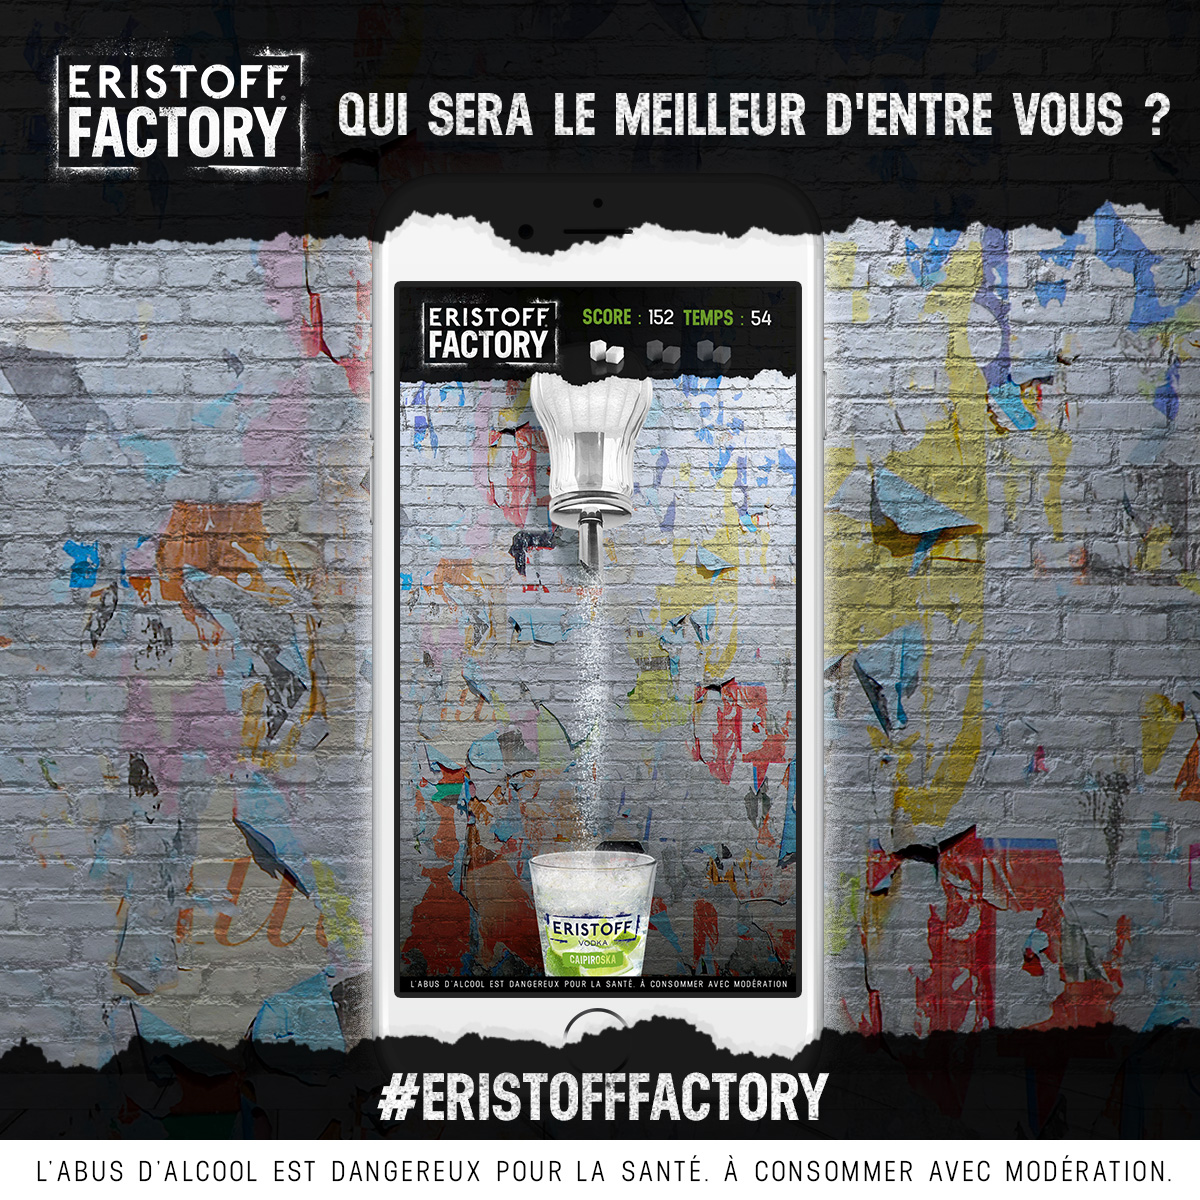 dans-ta-pub-eristoff-factory-brand-content-application-mobile-3